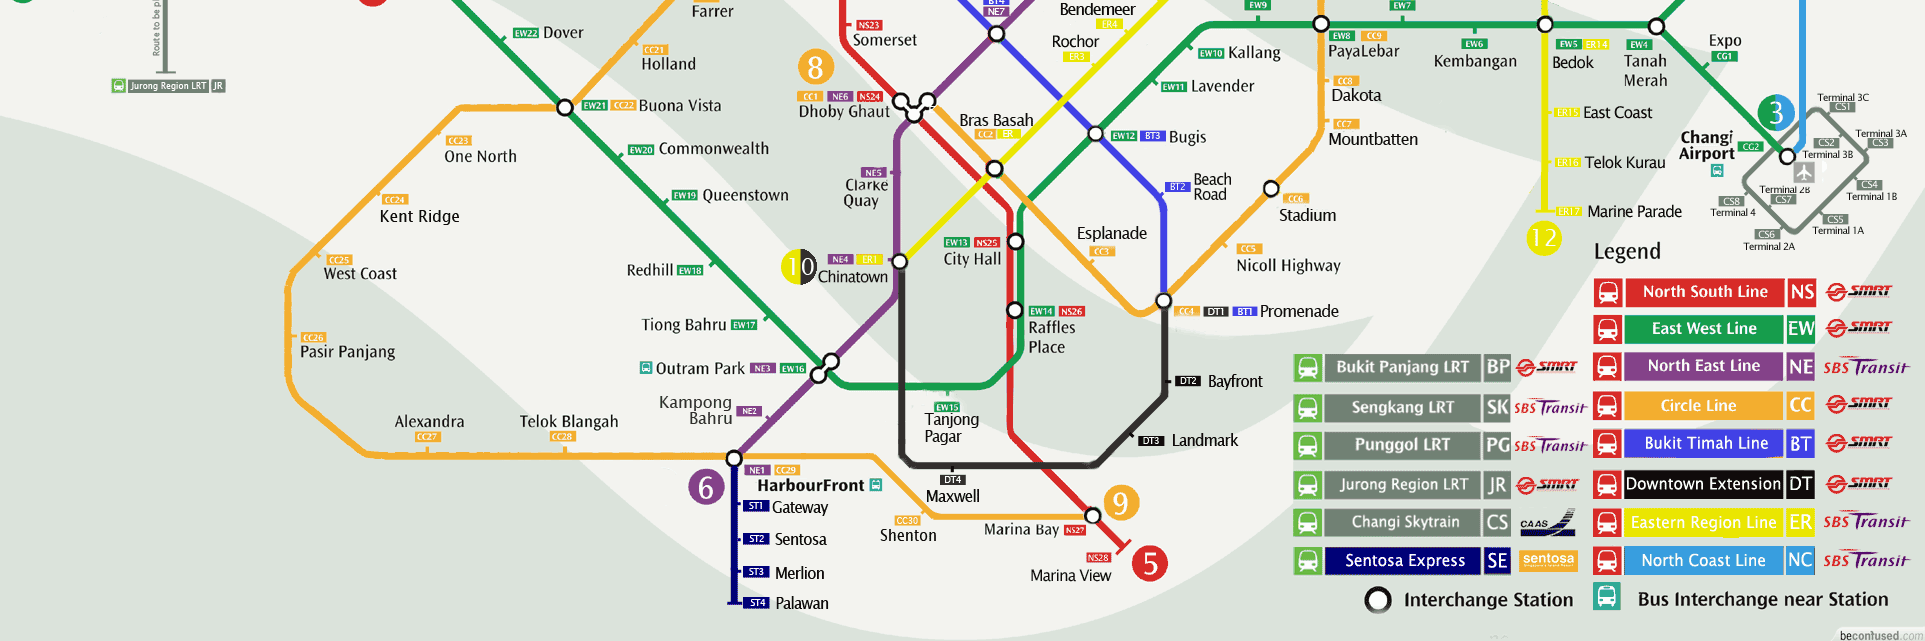 https://gody.vn/blog/oanhntk19947095/post/kinh-nghiem-di-mrt-o-singapore-2006